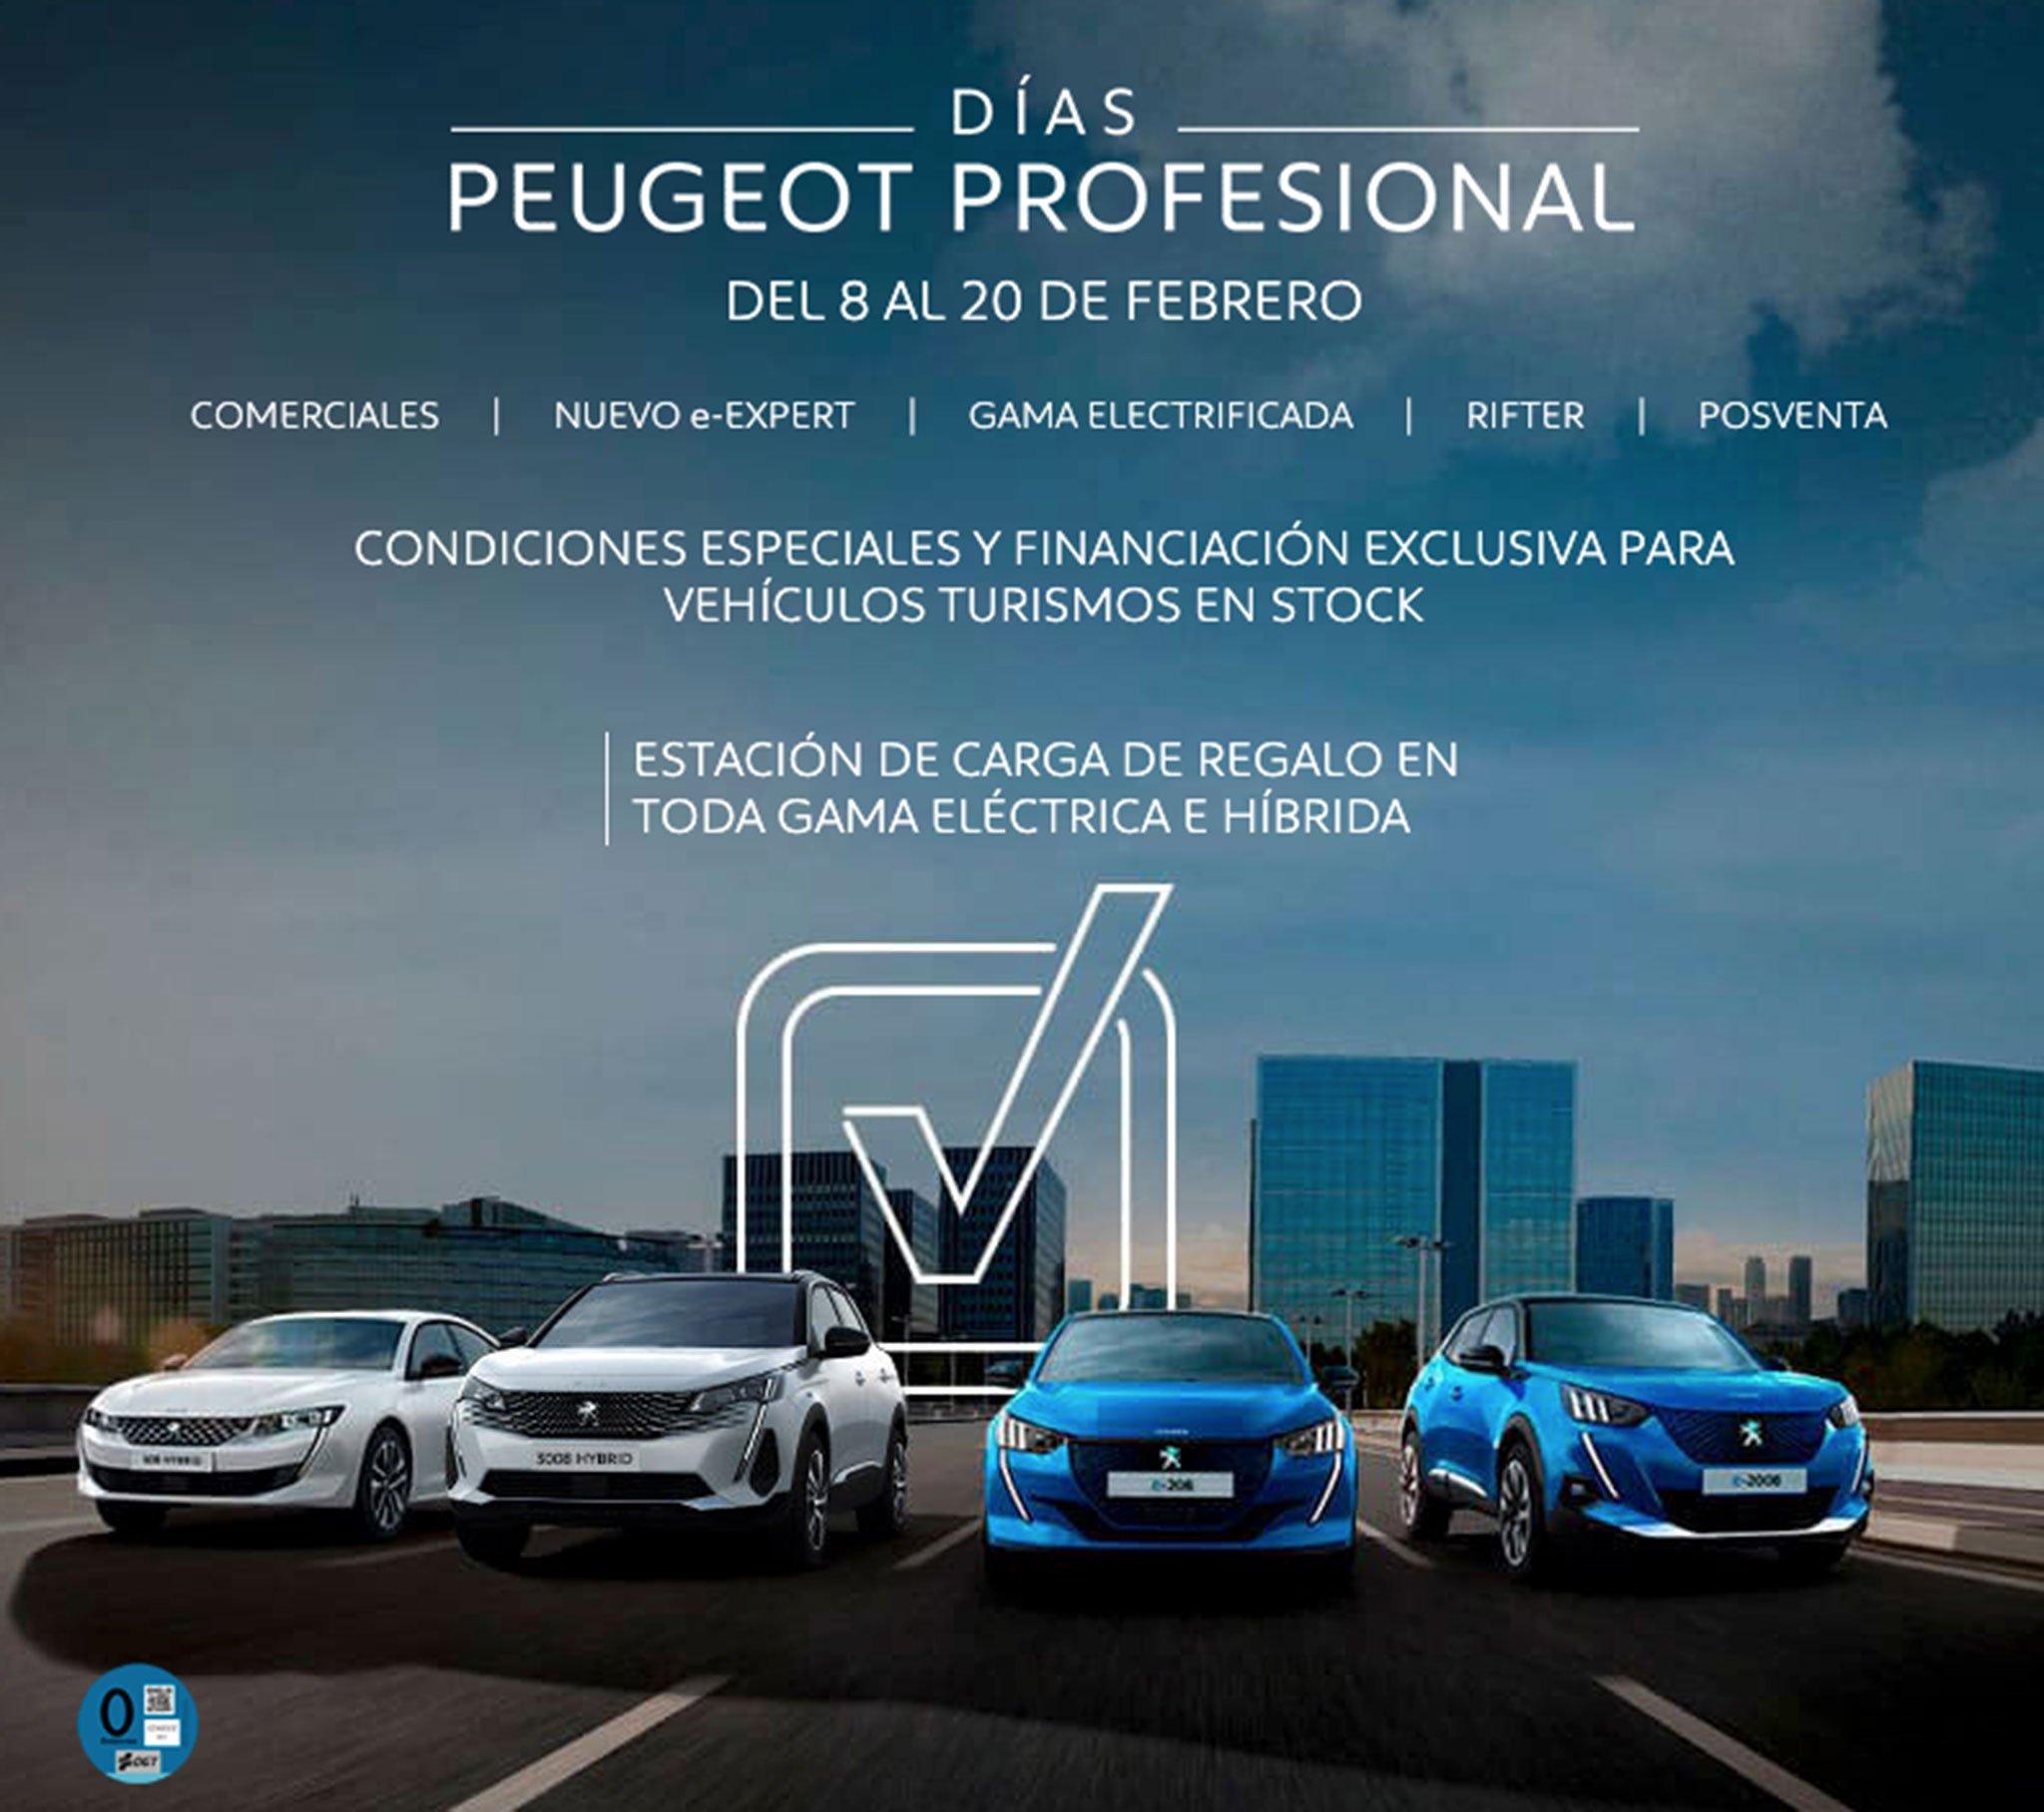 Días Peugeot Profesional en Peumóvil